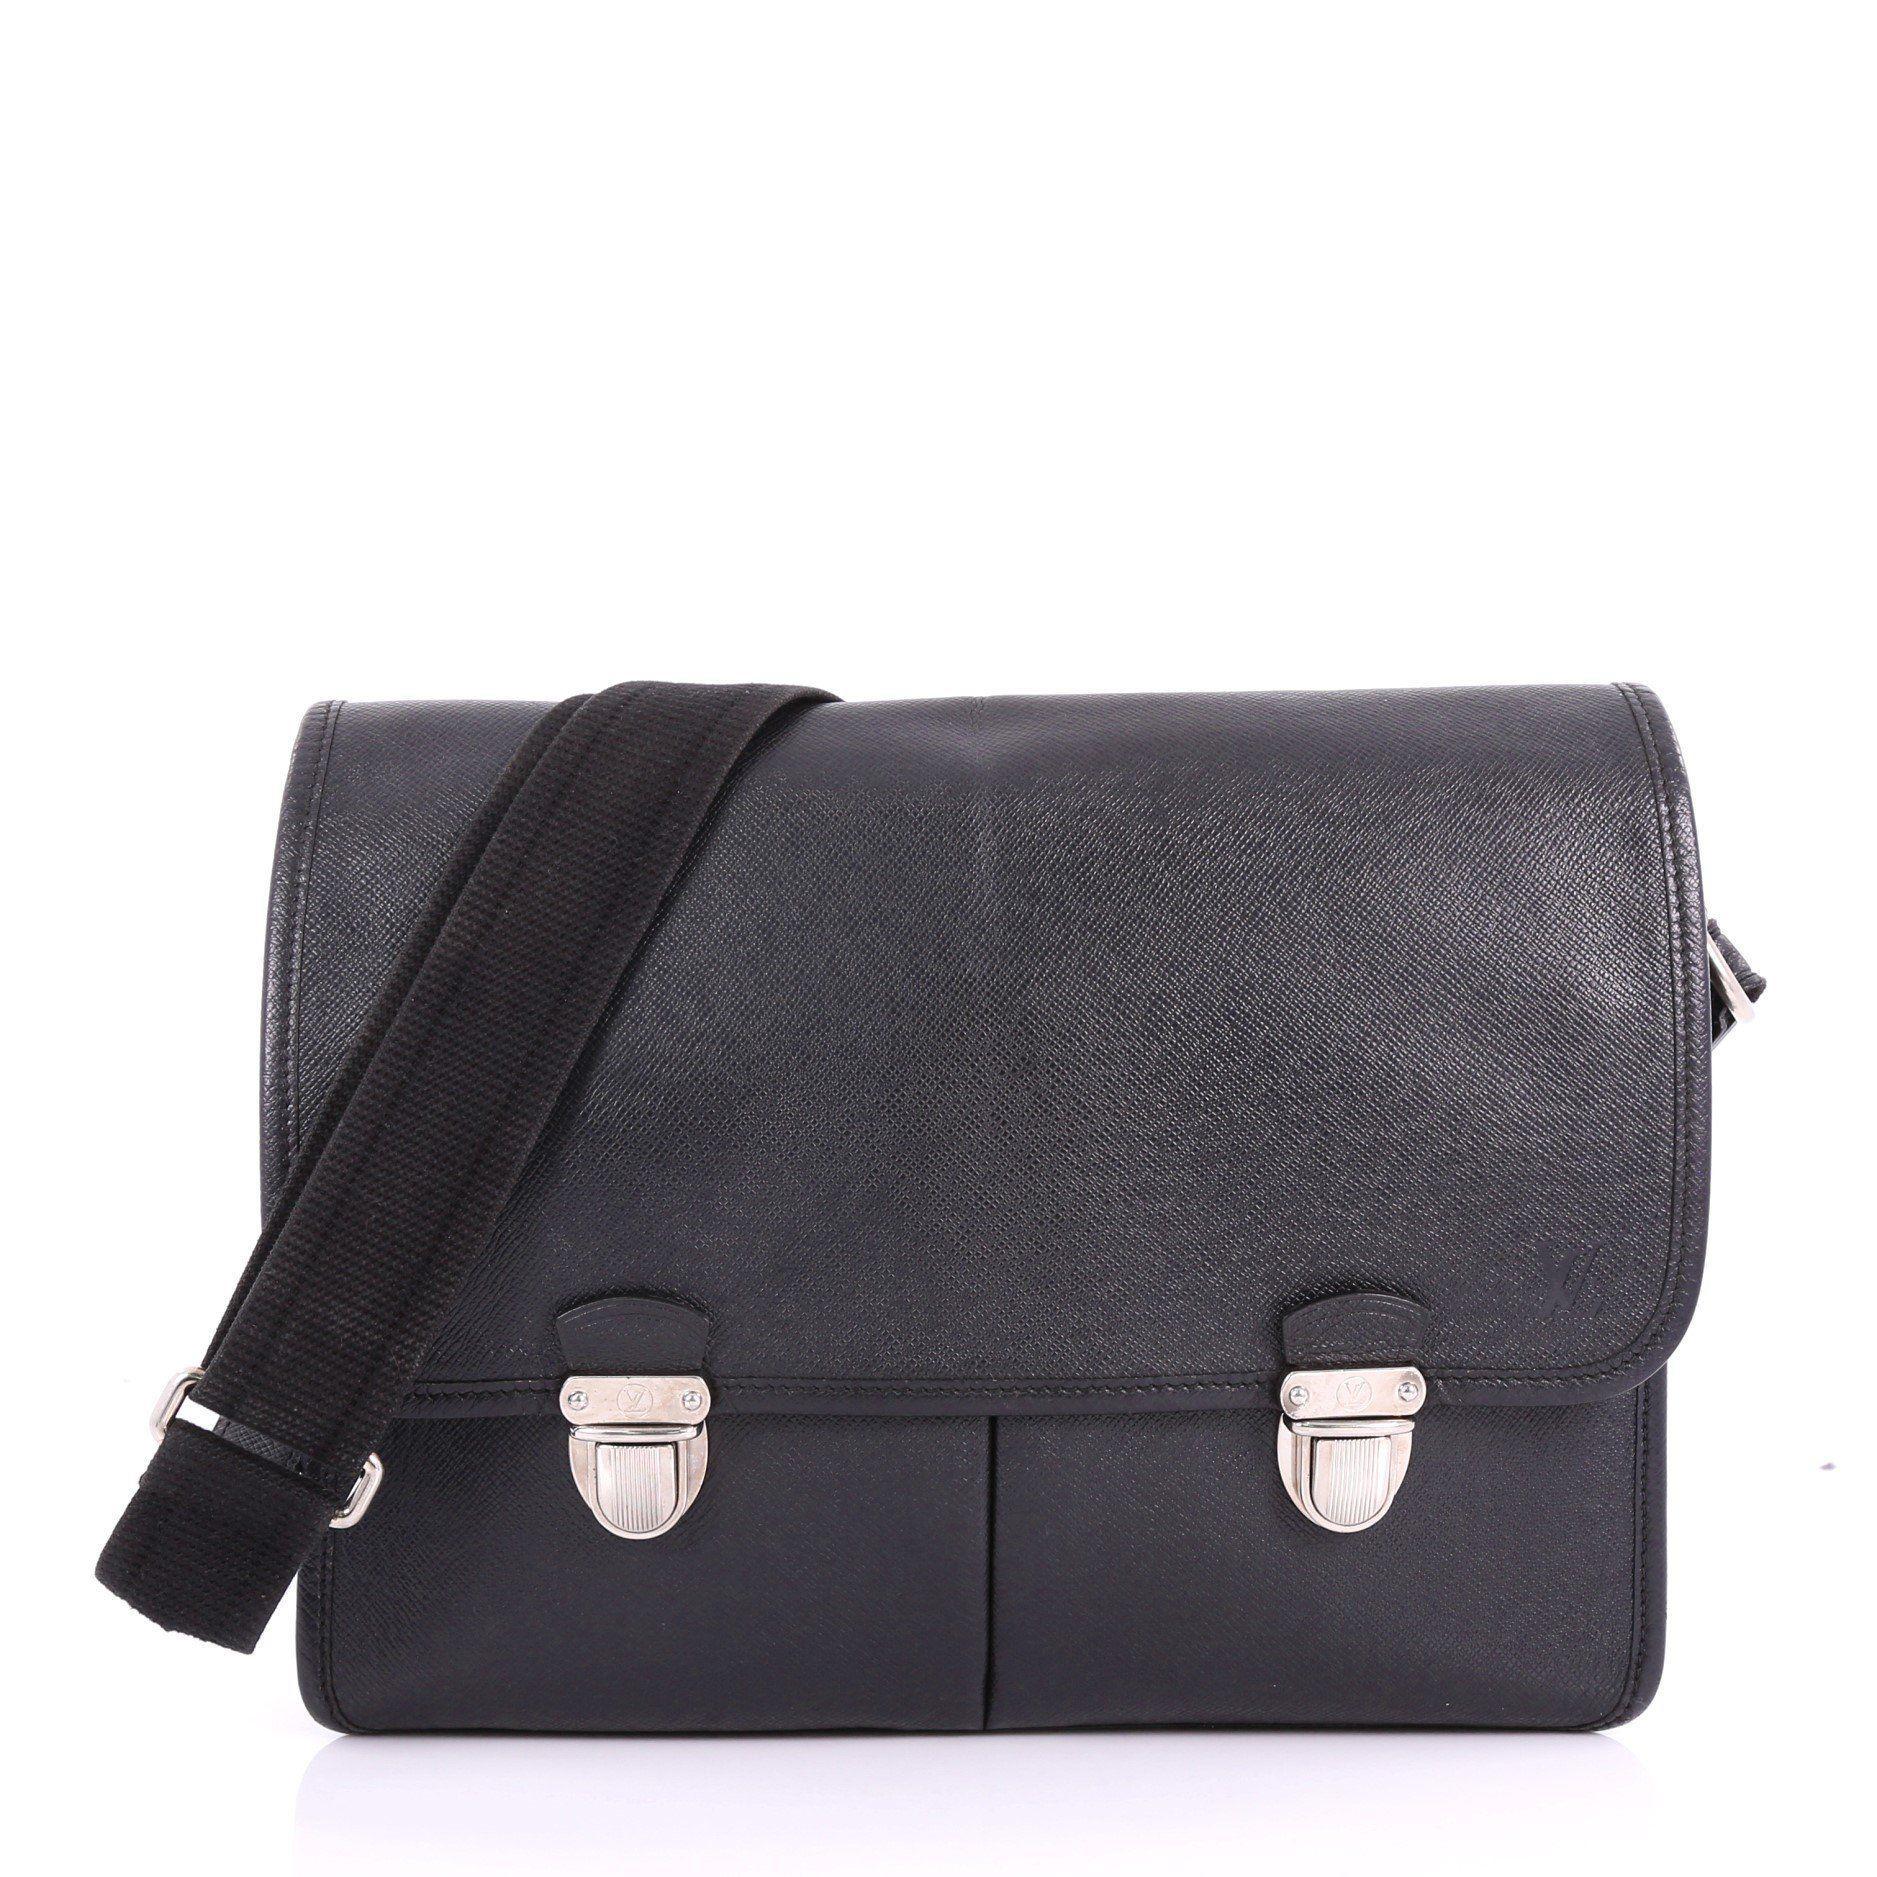 Louis Vuitton. Women s Pre Owned Alexei Messenger Bag Taiga Leather daf6ac5e3cfb1